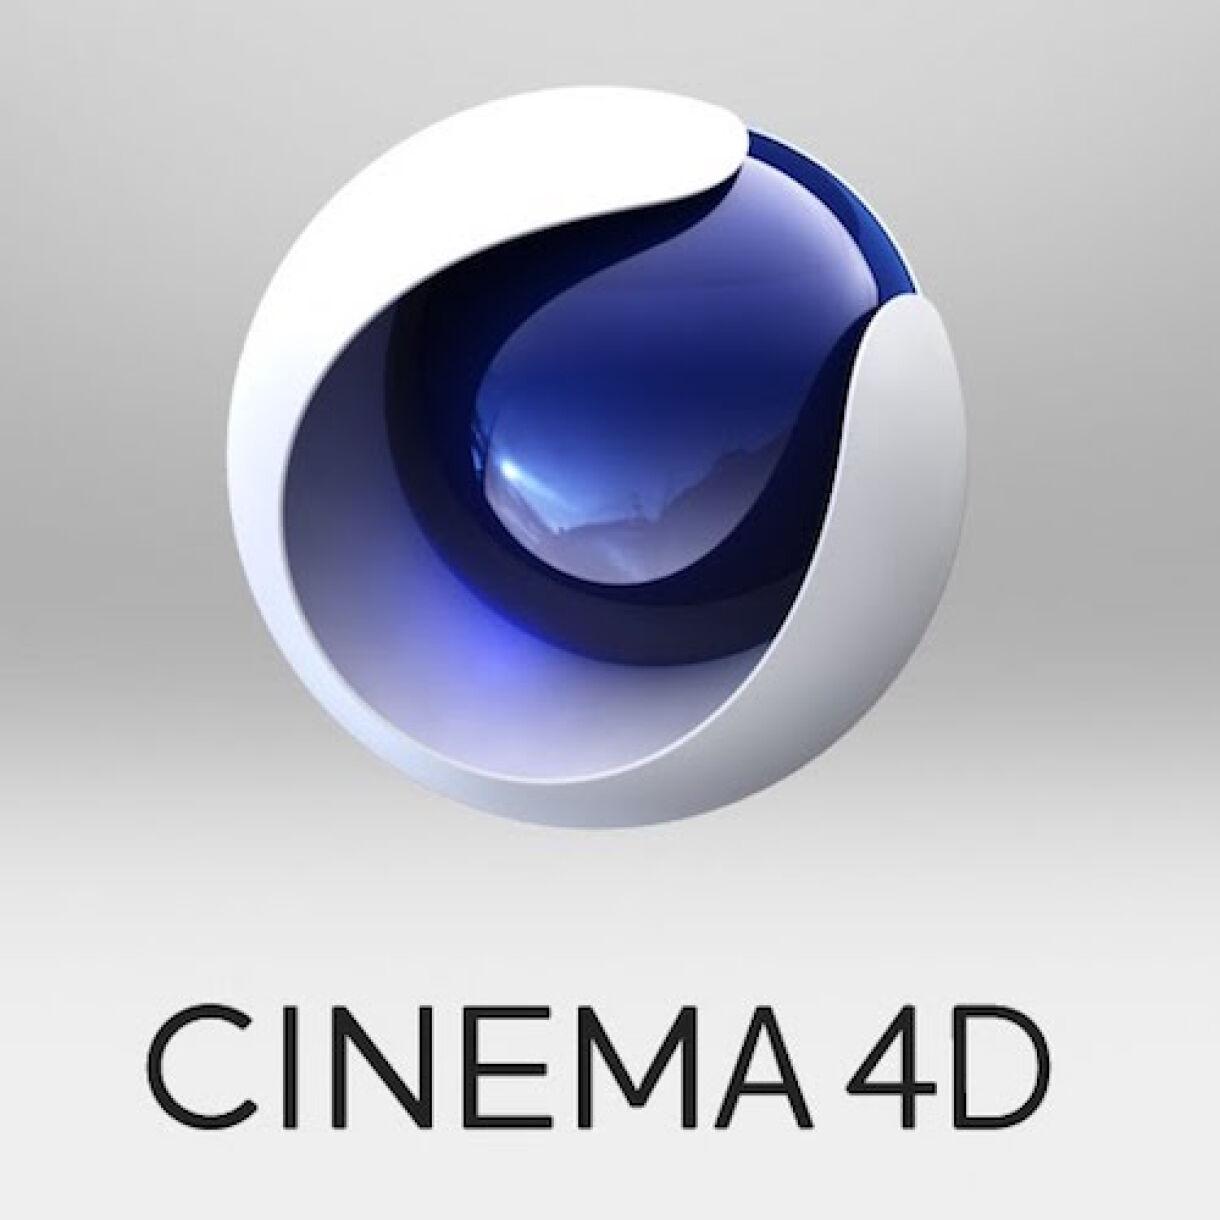 Cinema 4D Release 18 Announced by MAXON